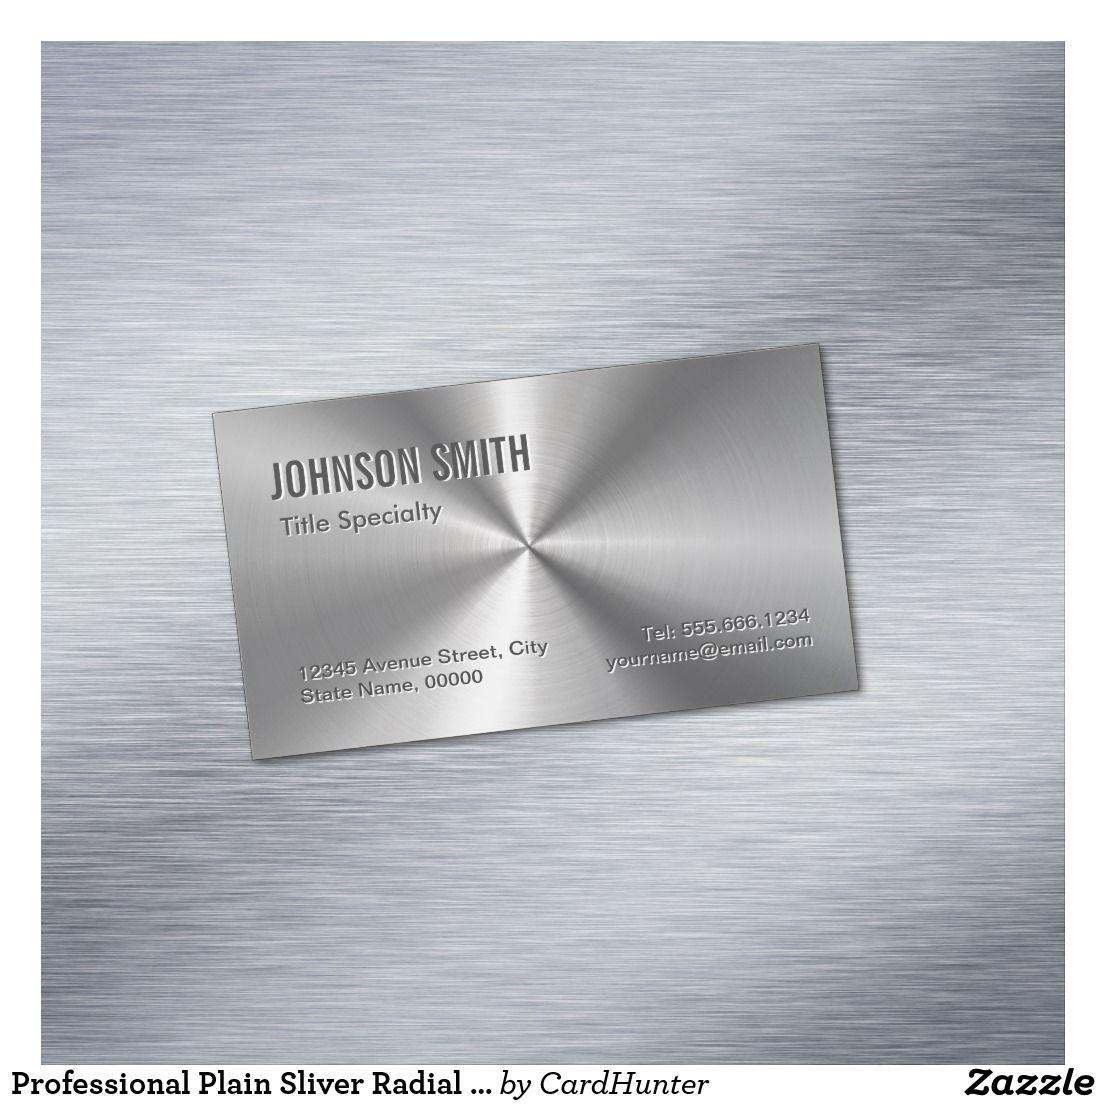 Professional Plain Sliver Radial Metallic Look Business Card Magnet ...